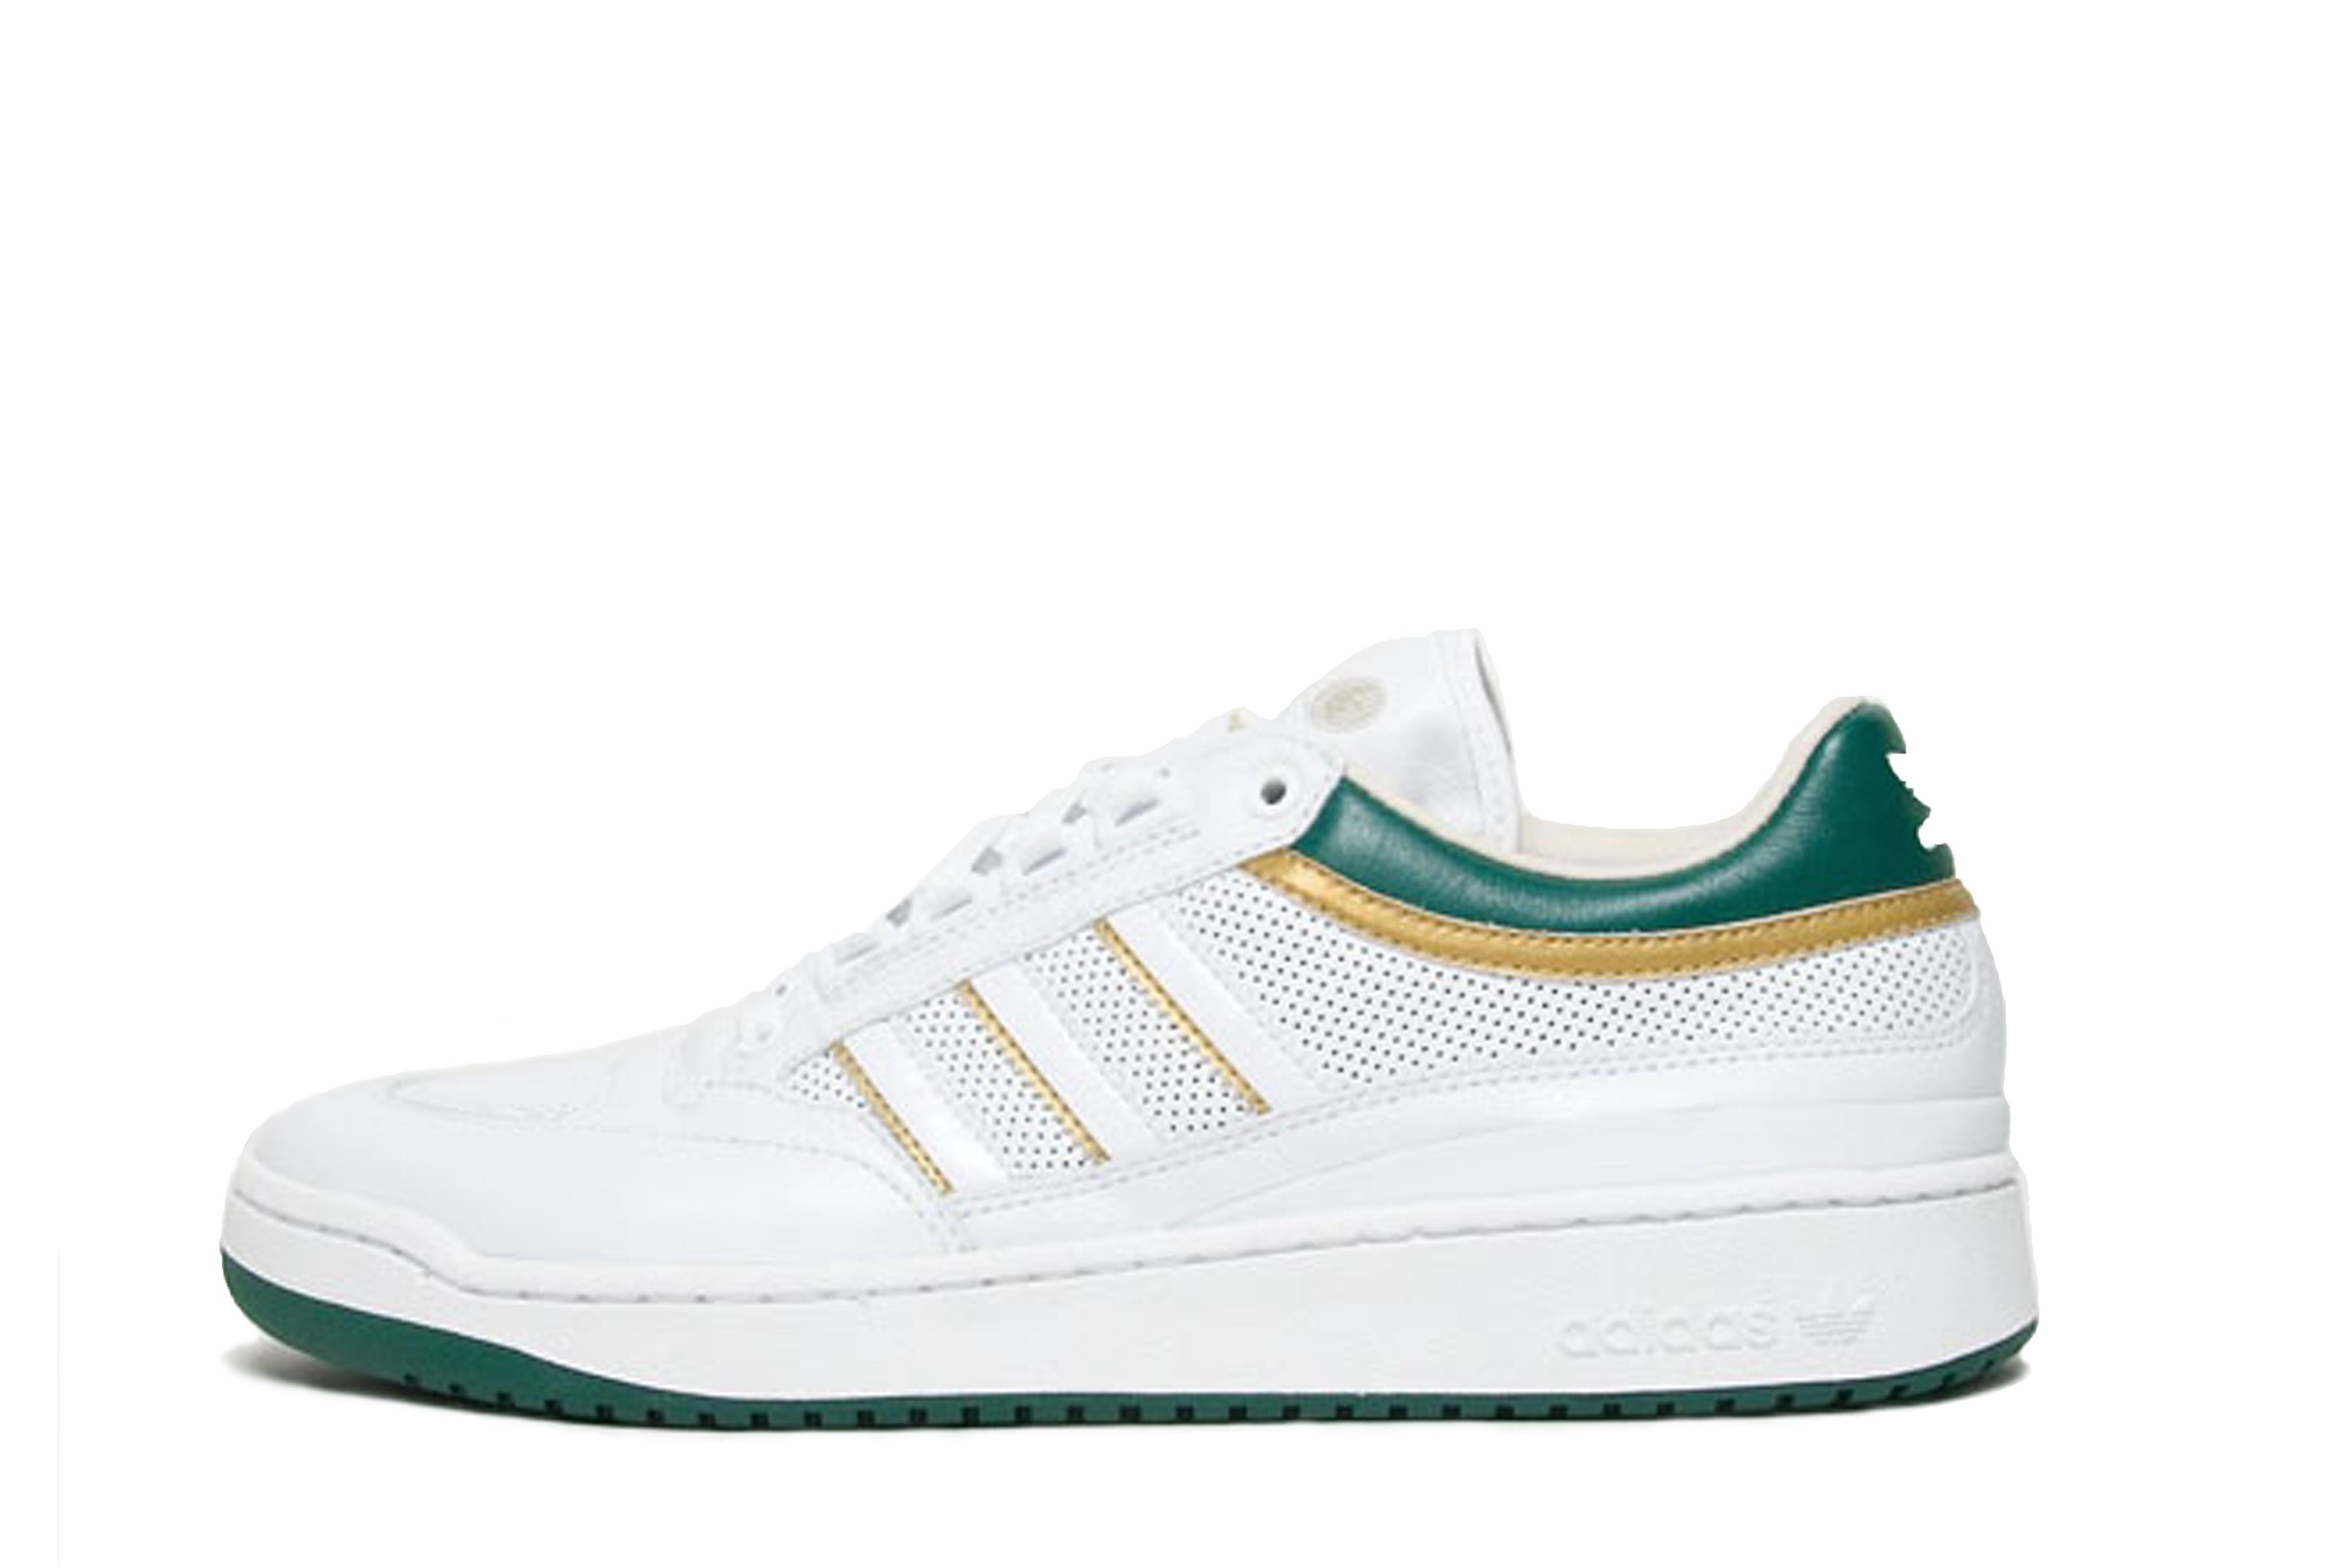 adidas originals Ivan Lendl Competition